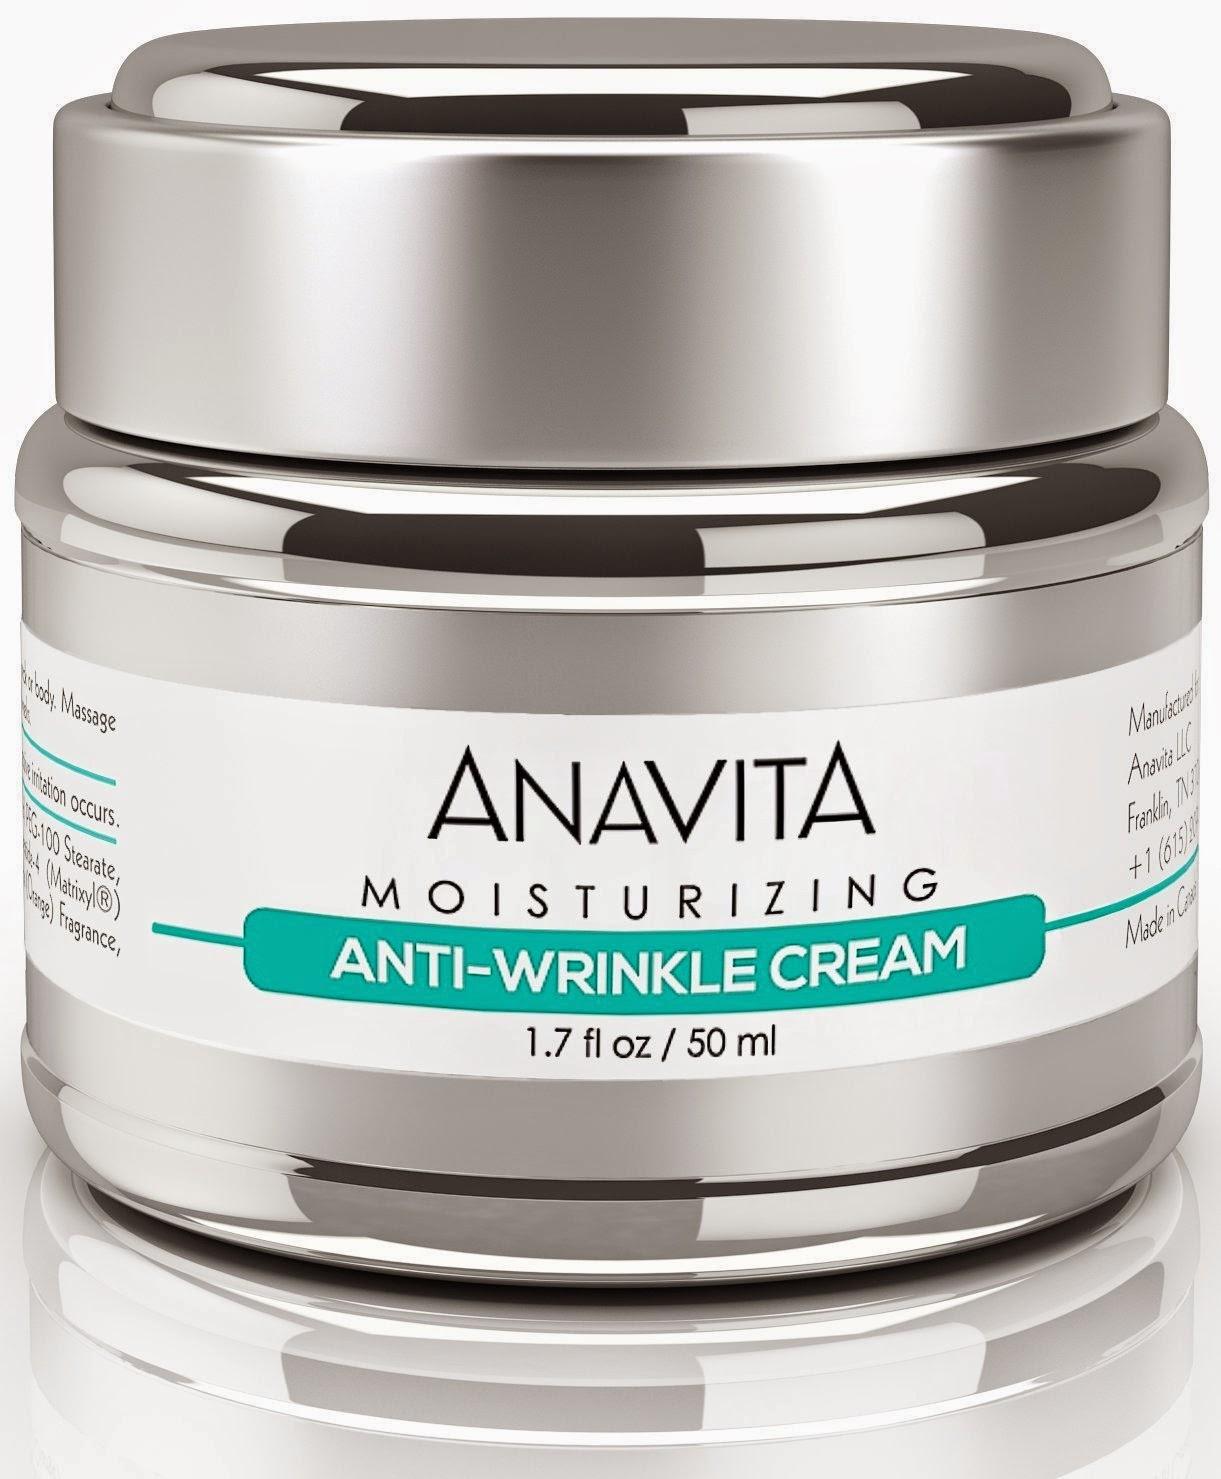 Botox and Derma Fillers Anavita Cream